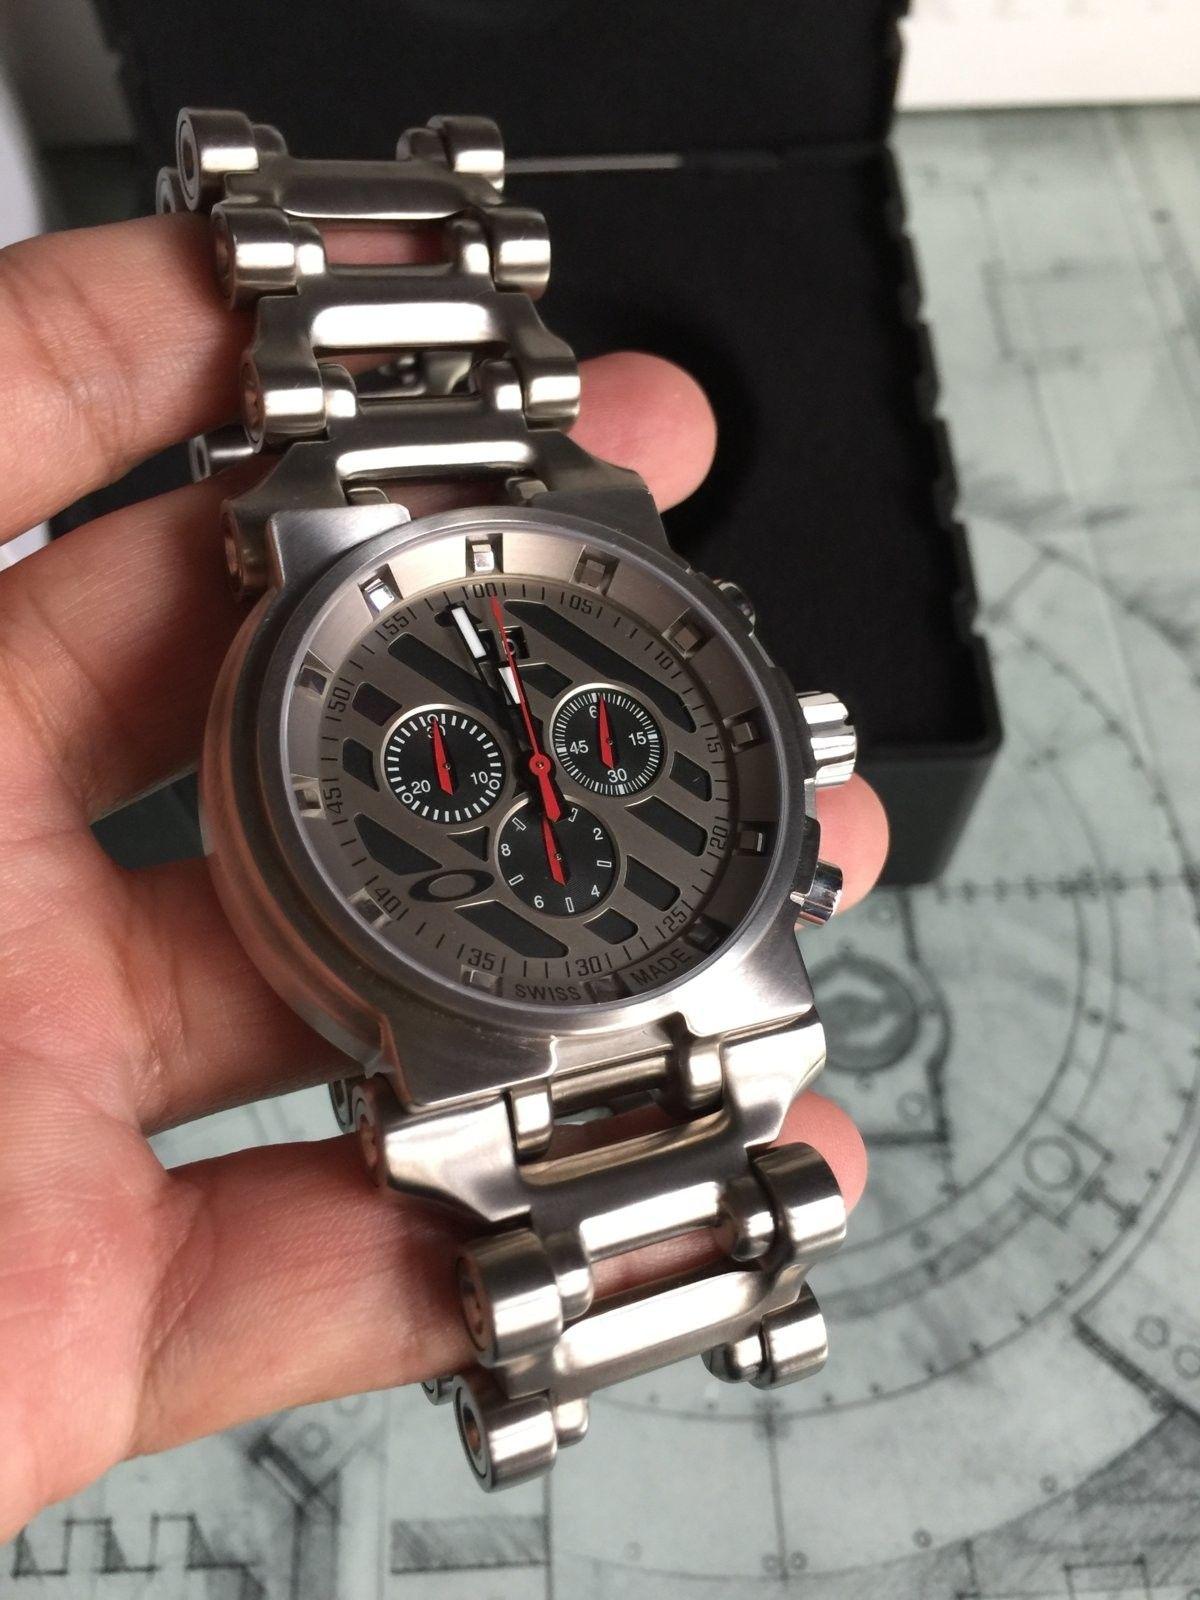 LNIB Black Dial Hollow Point watch - IMG_6064.JPG